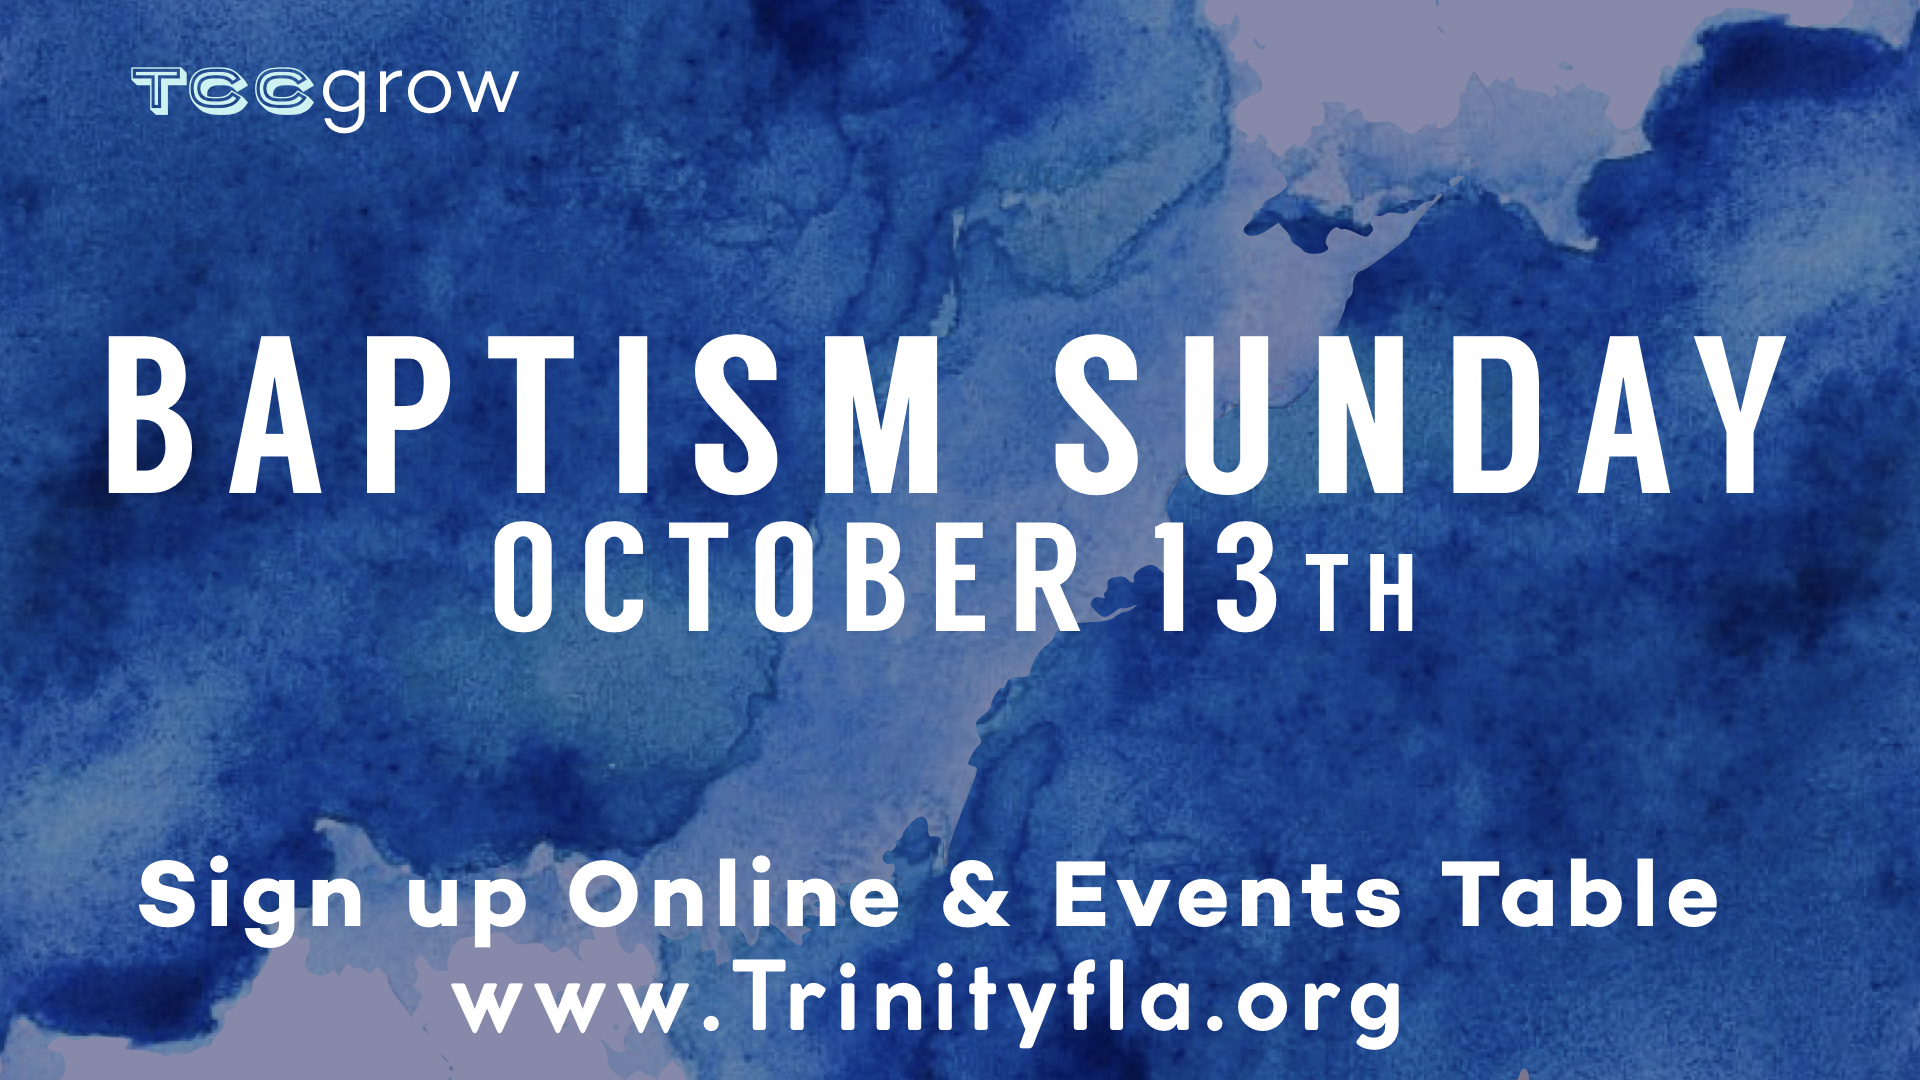 TCC Graphics - Baptism Sunday.001.jpeg